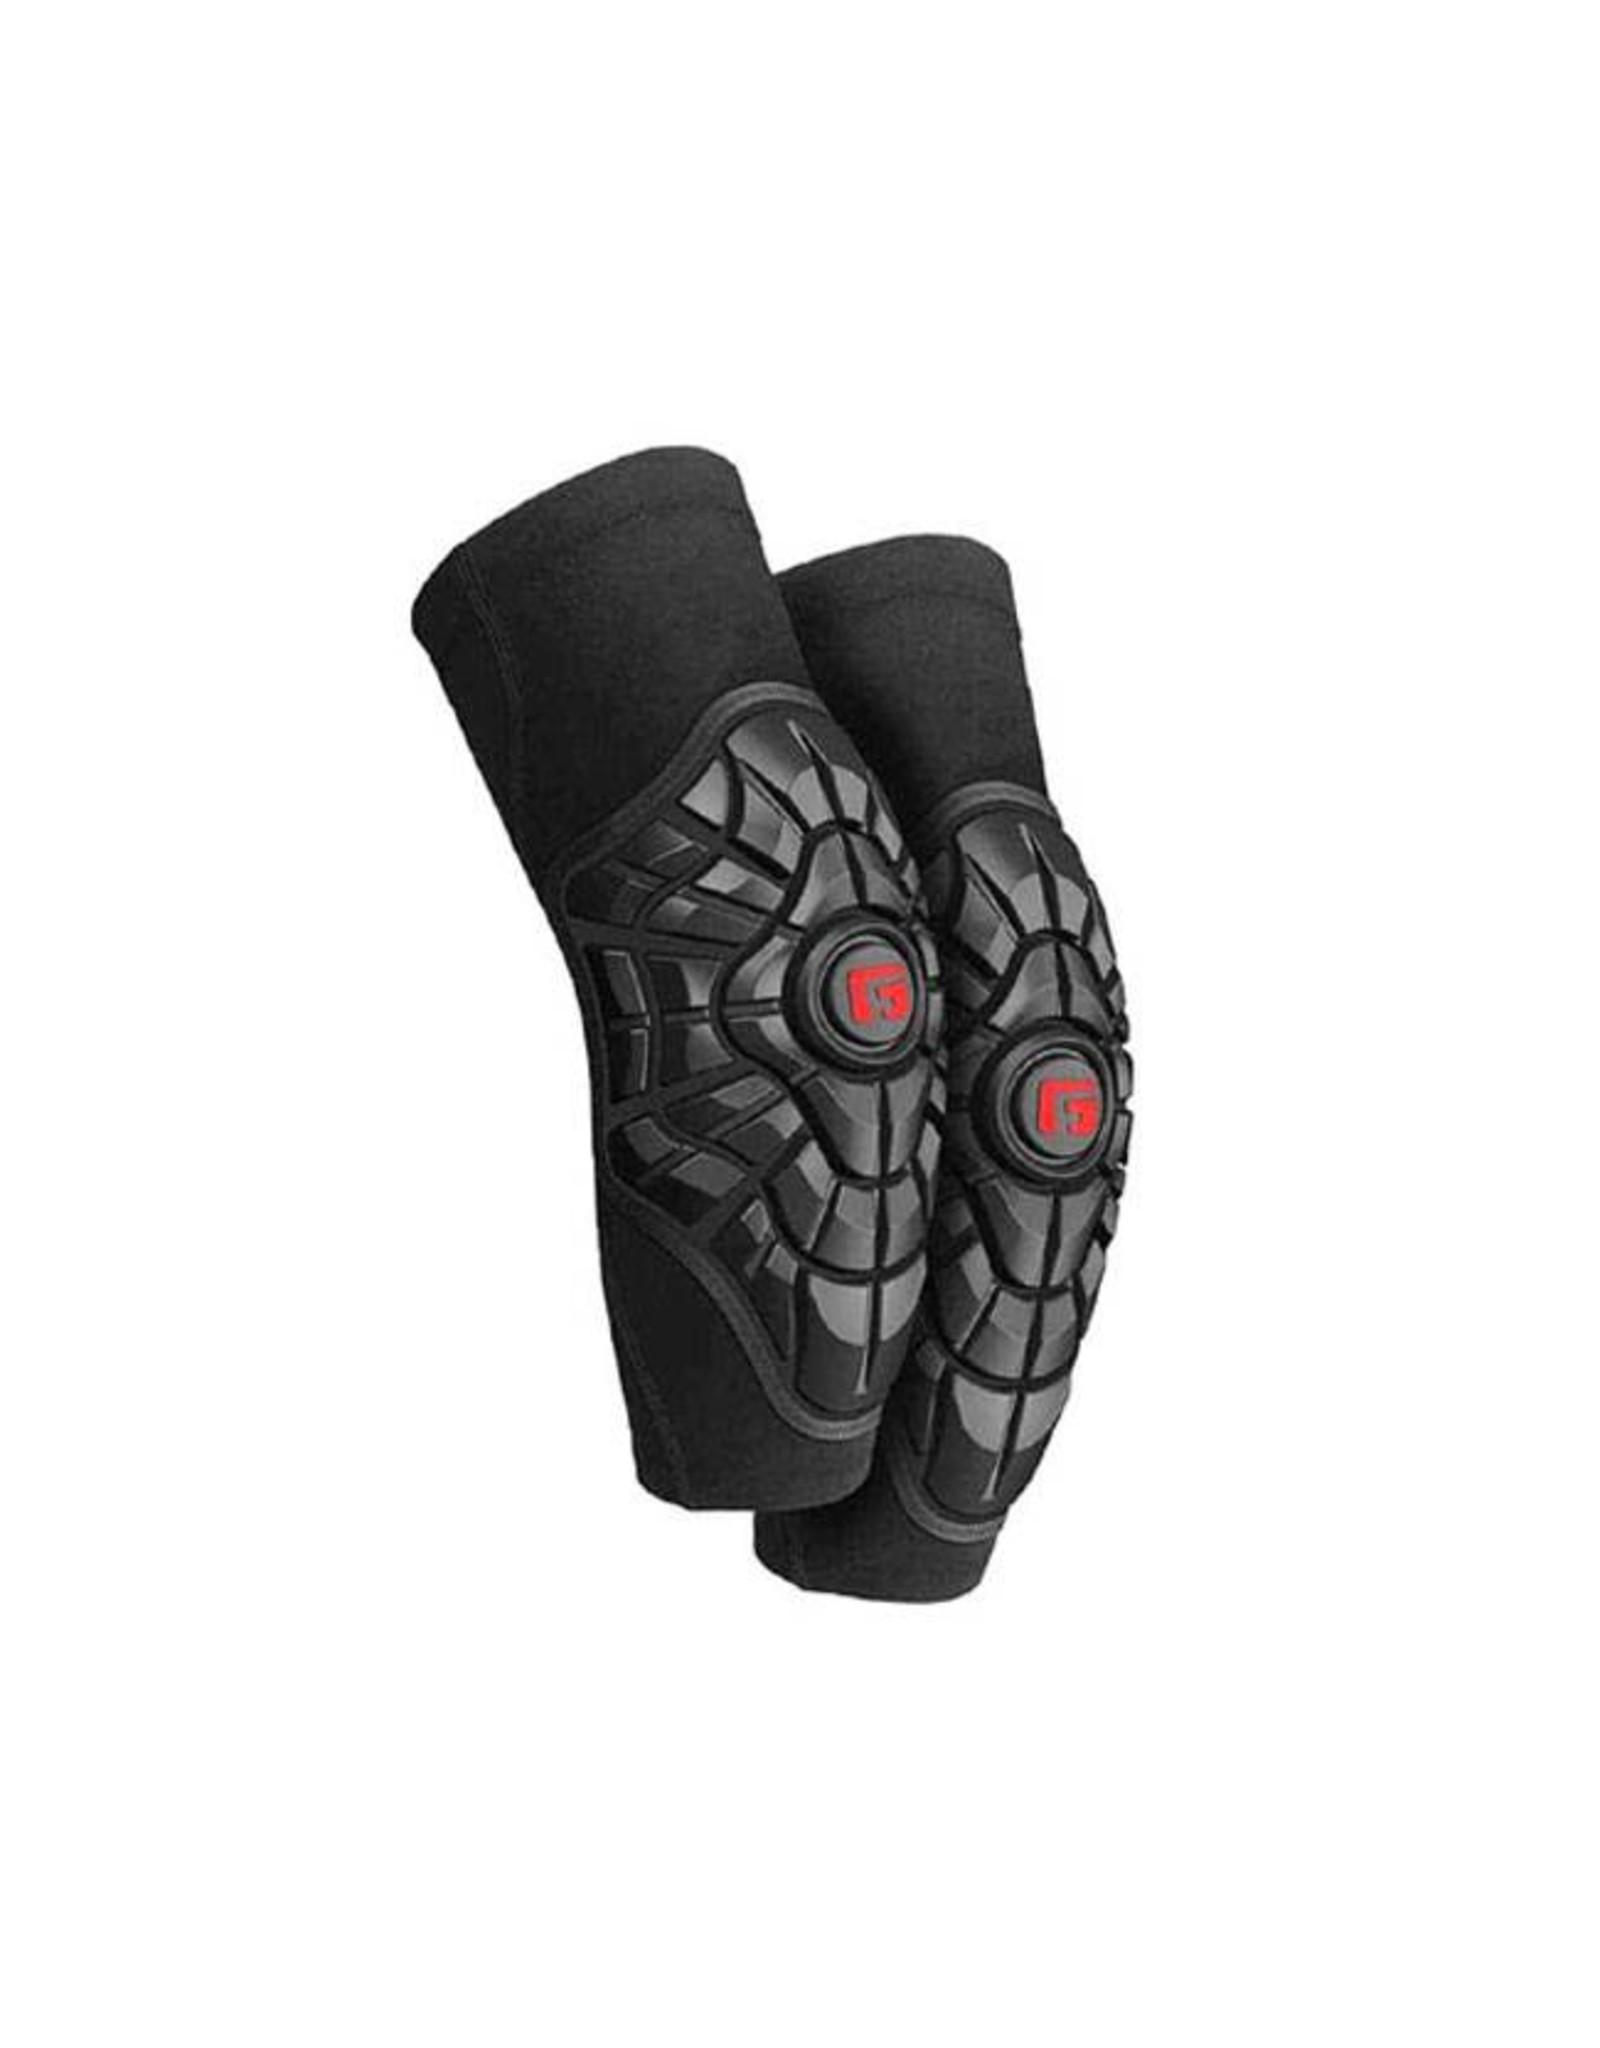 G-Form G-Form Elite Elbow Pad: Black SM